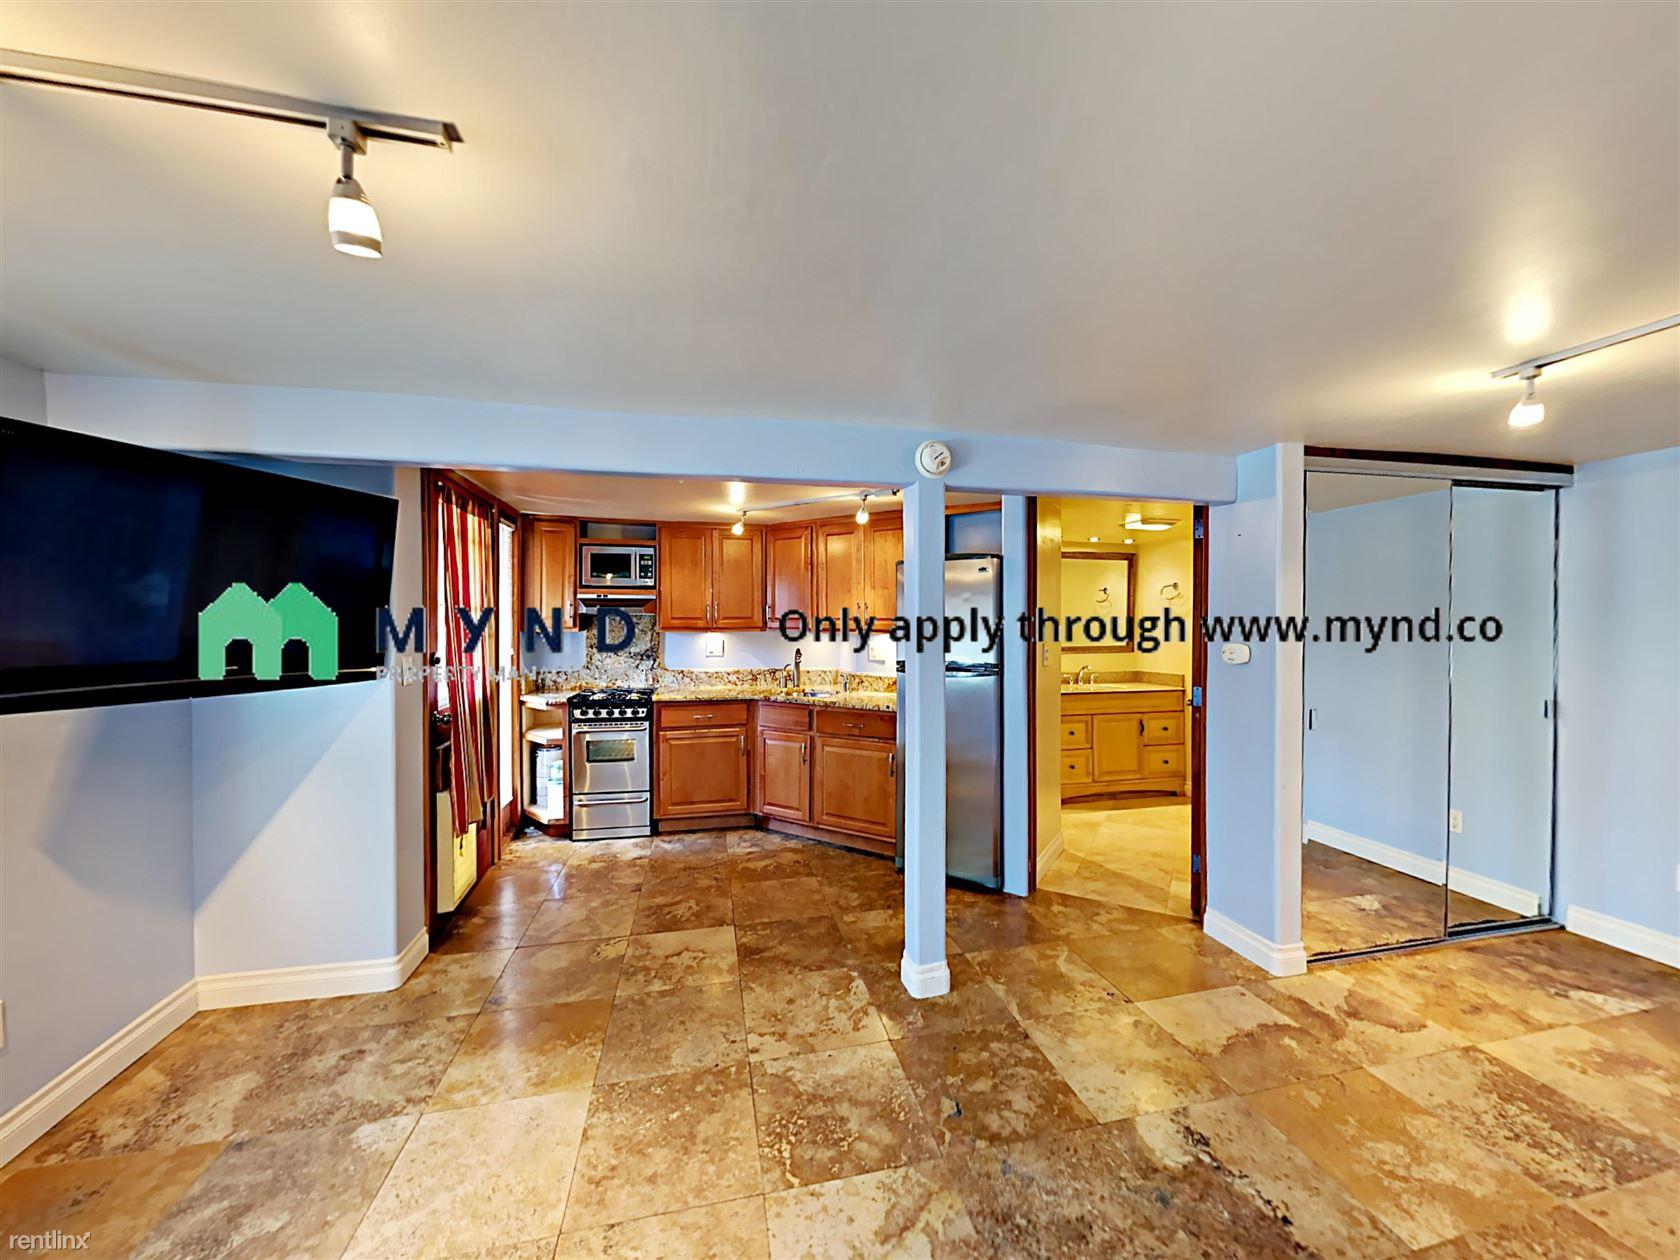 1660B Linwood St, San Diego, CA - $1,395